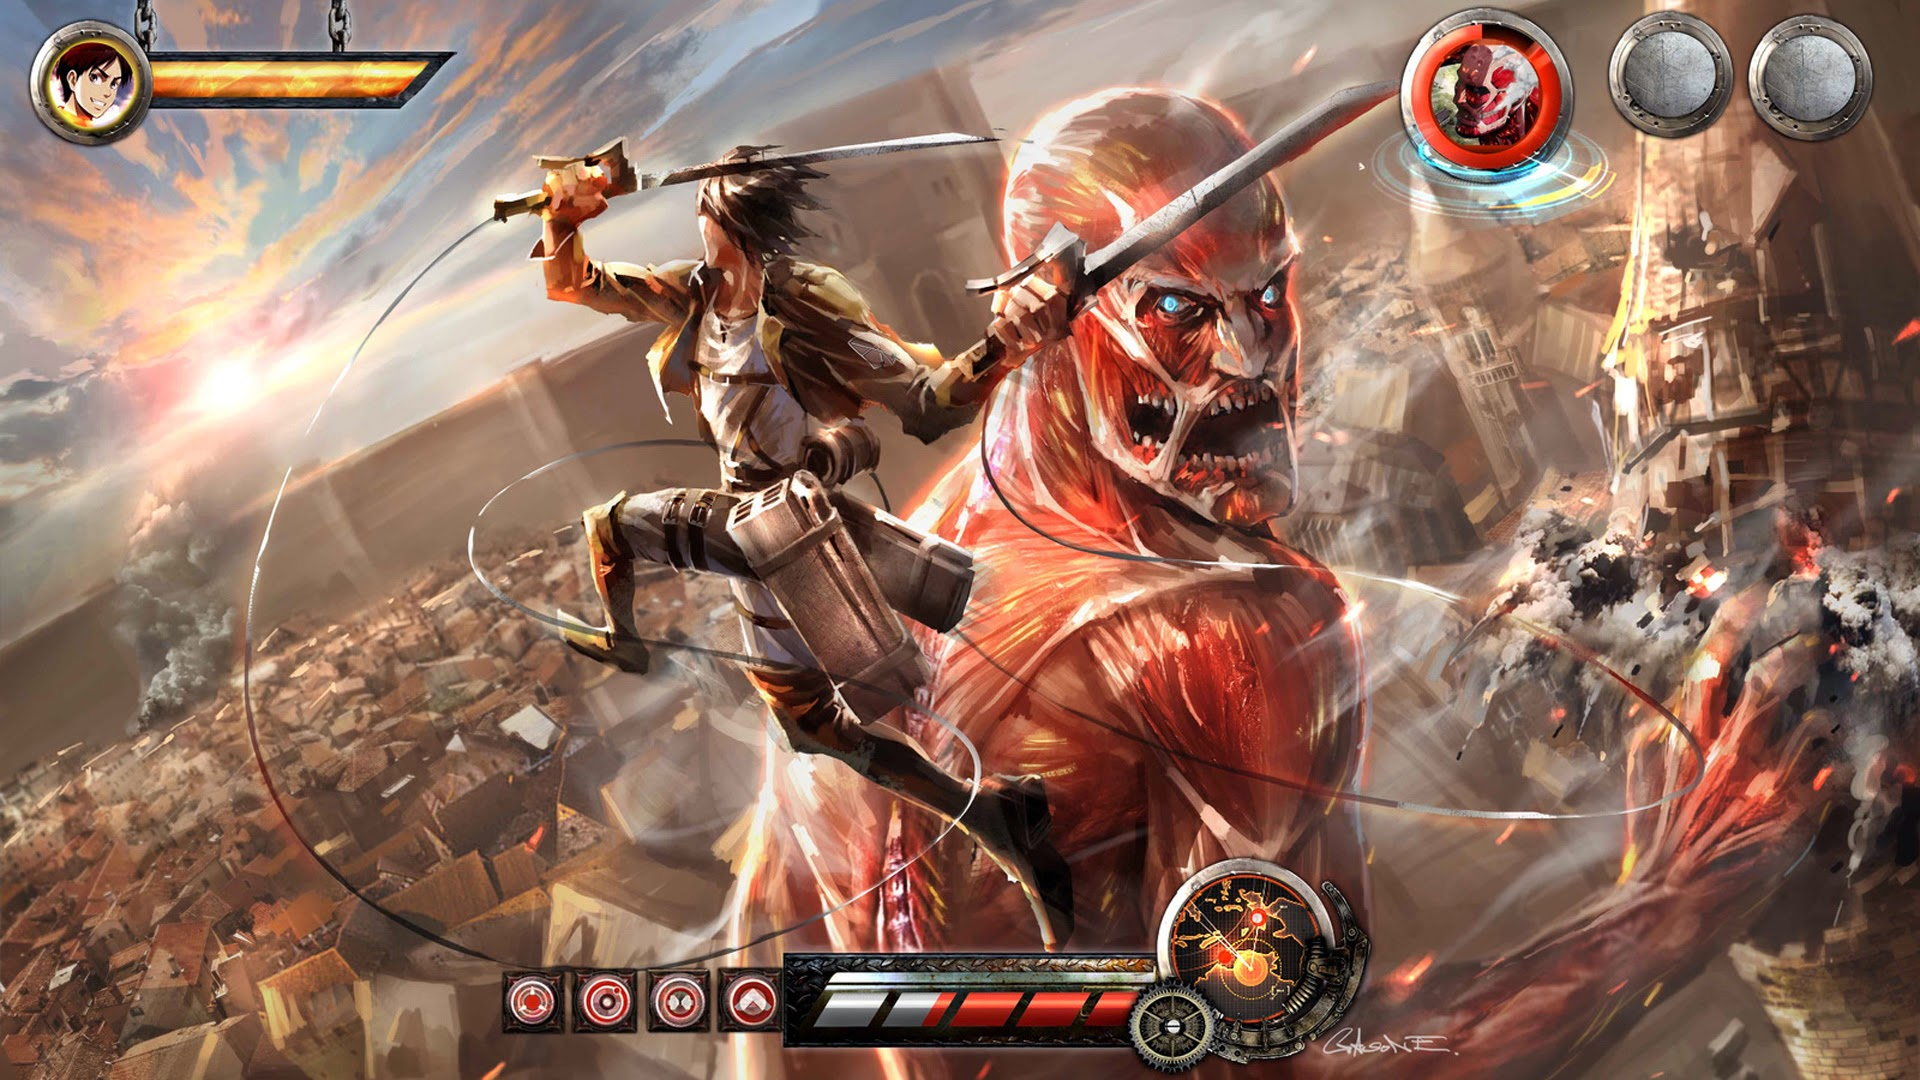 titan video game attack on titan shingeki no kyojin anime hd wallpaper 1920x1080